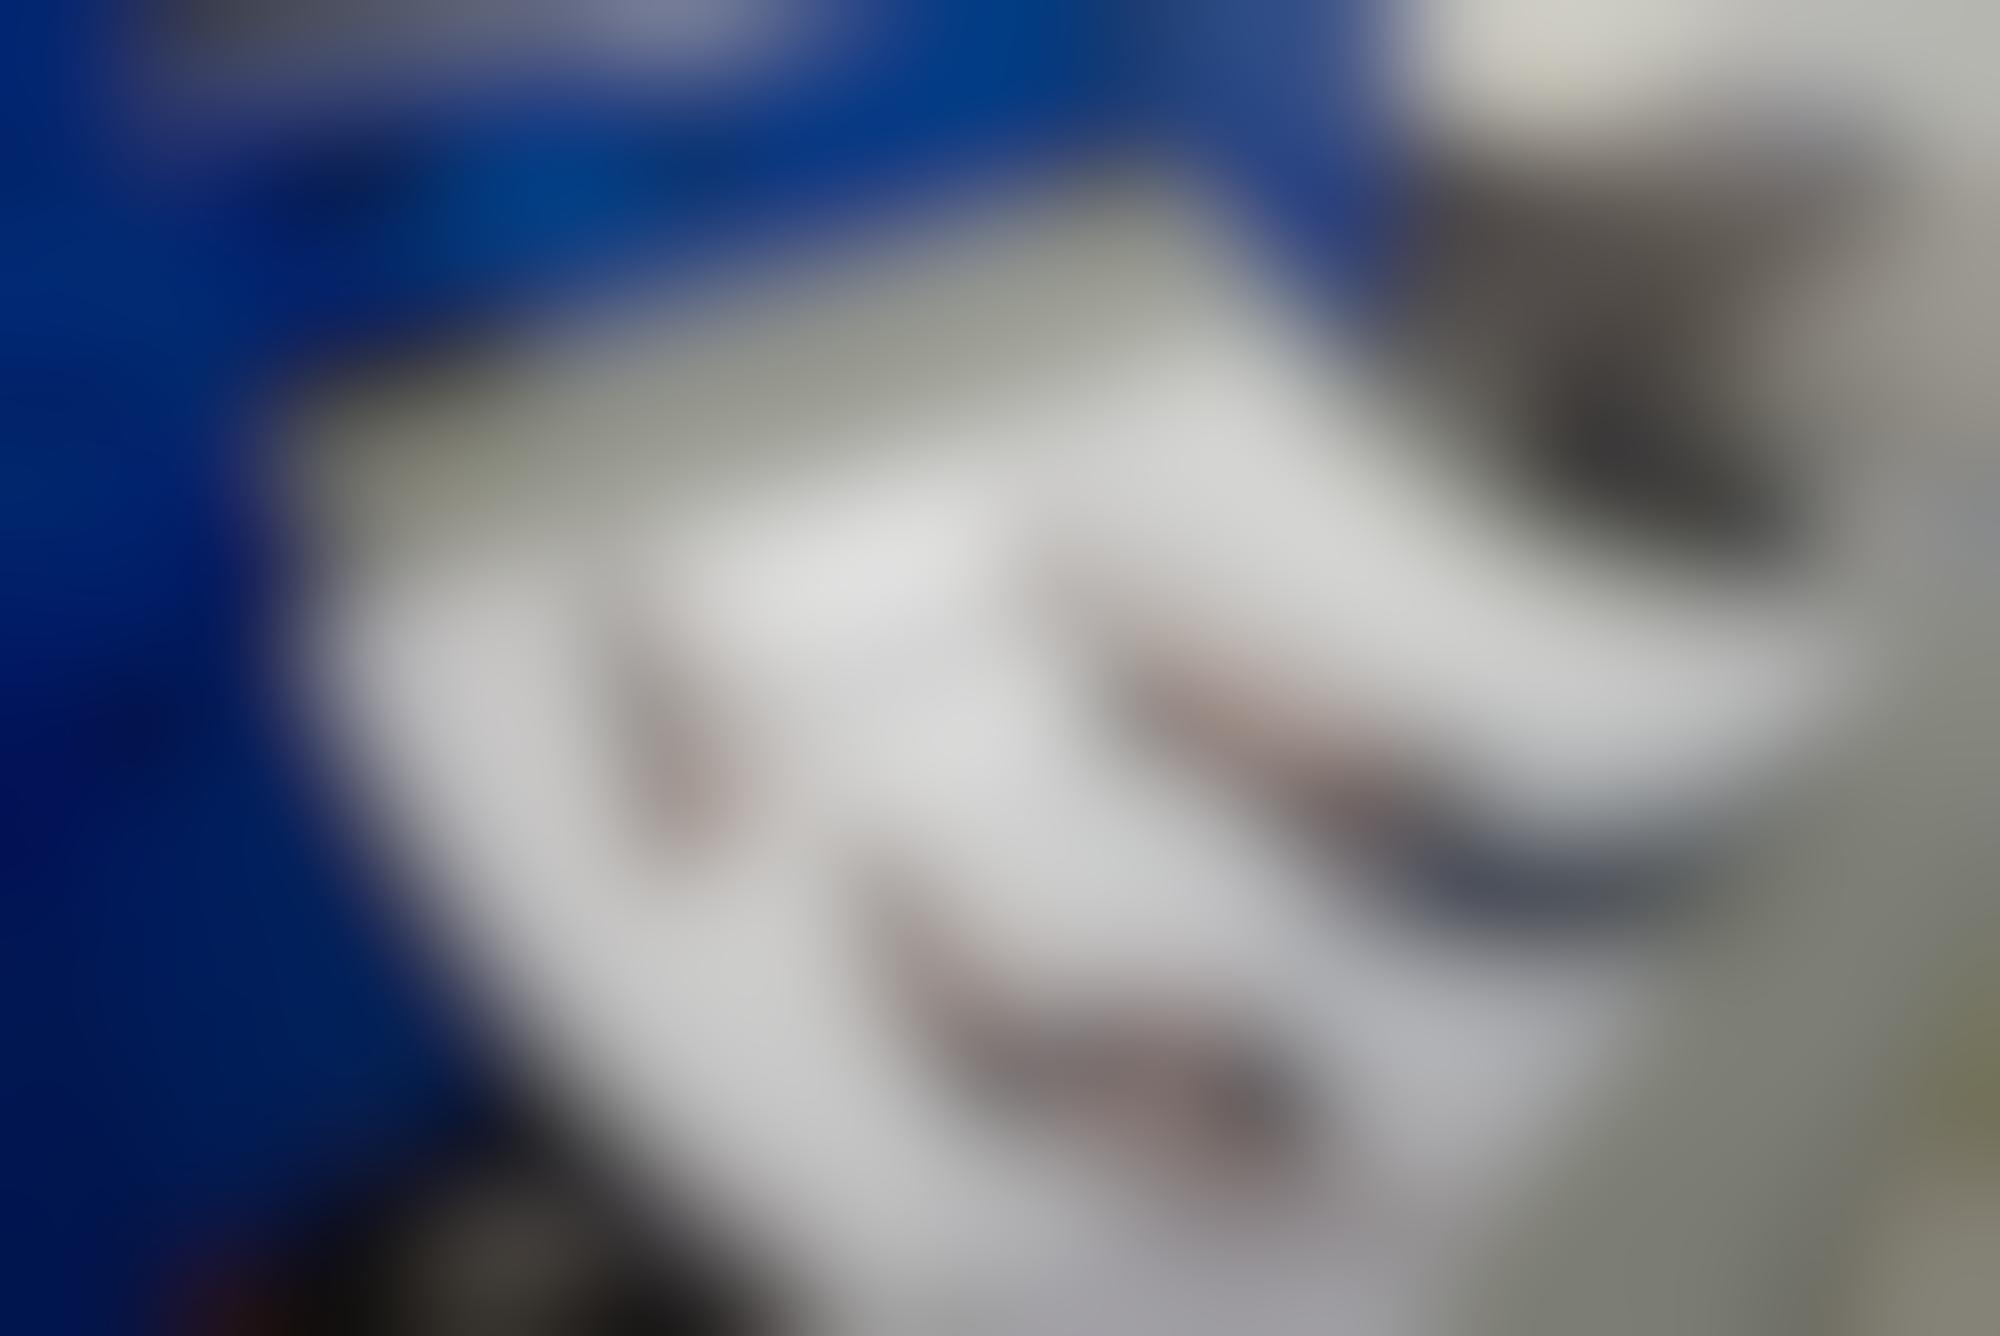 Gfsmith elise lectureinprogress 06 autocompressfitresizeixlibphp 1 1 0max h2000max w3 D2000q80s300b9ec5f5a8aa5636b9e316a03586e8